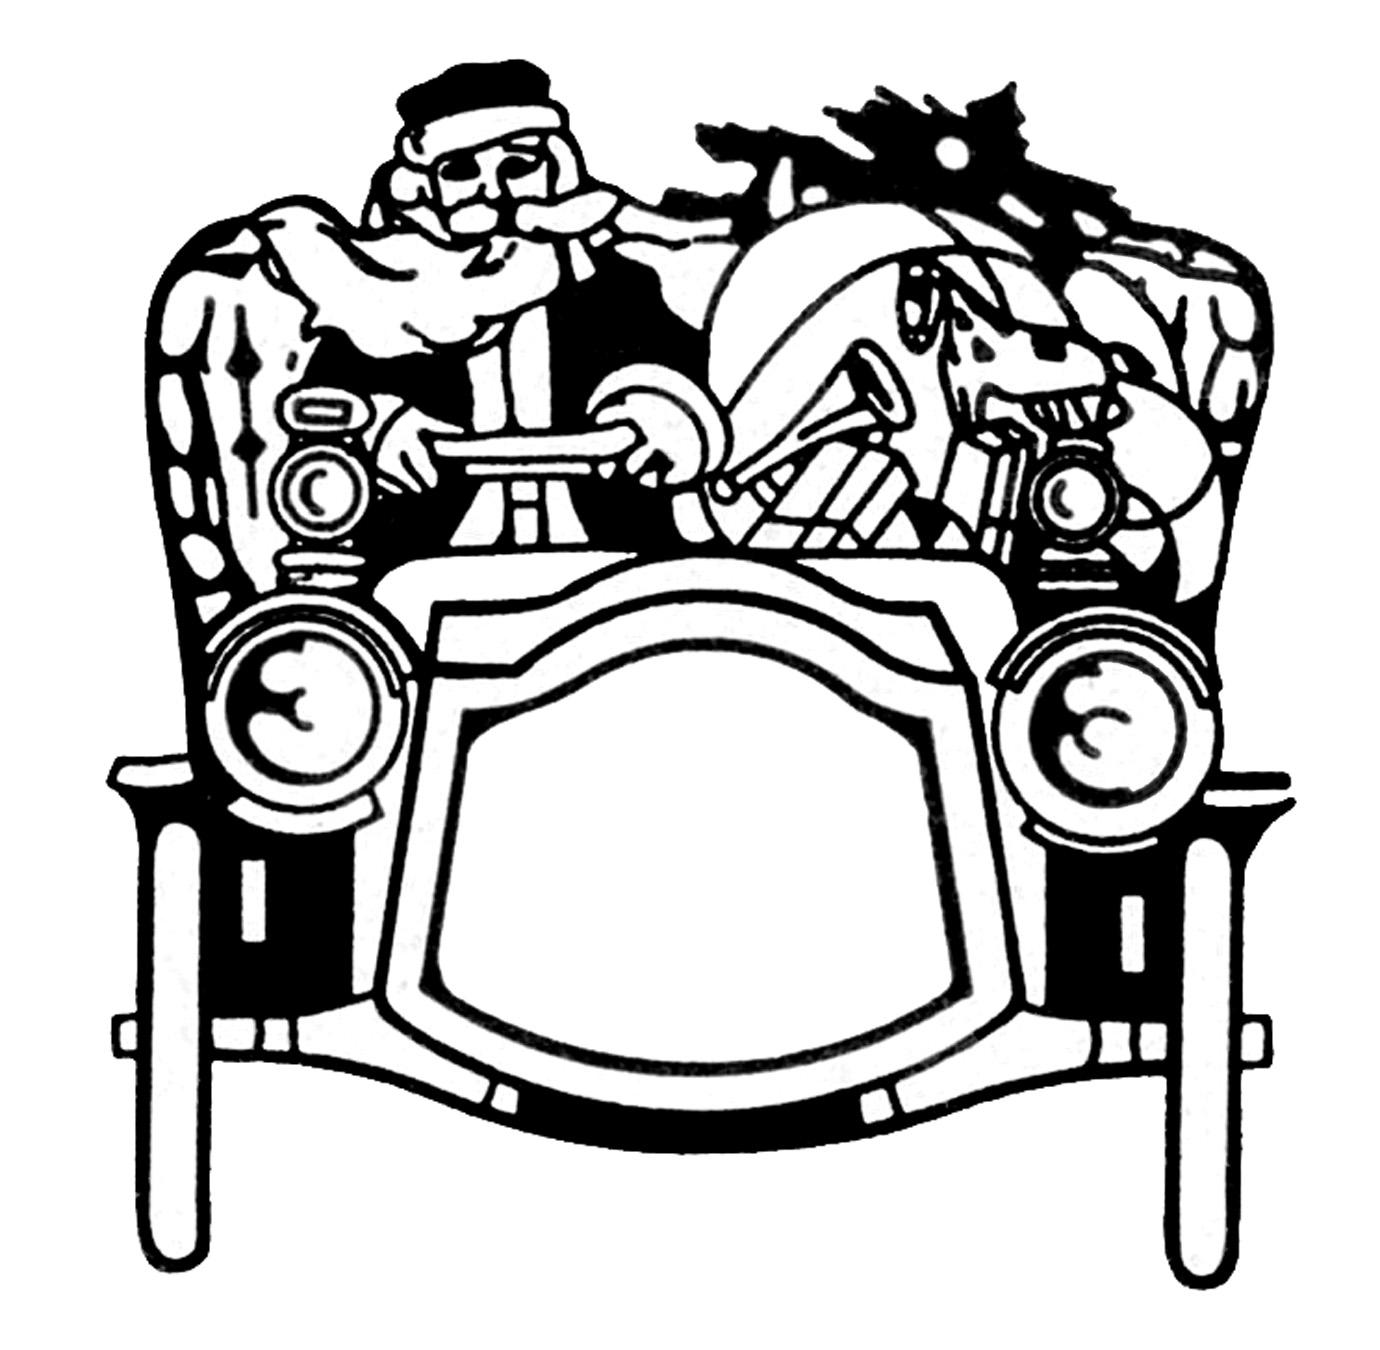 Vintage Christmas Clip Art - Santa in Automobile - The Graphics Fairy